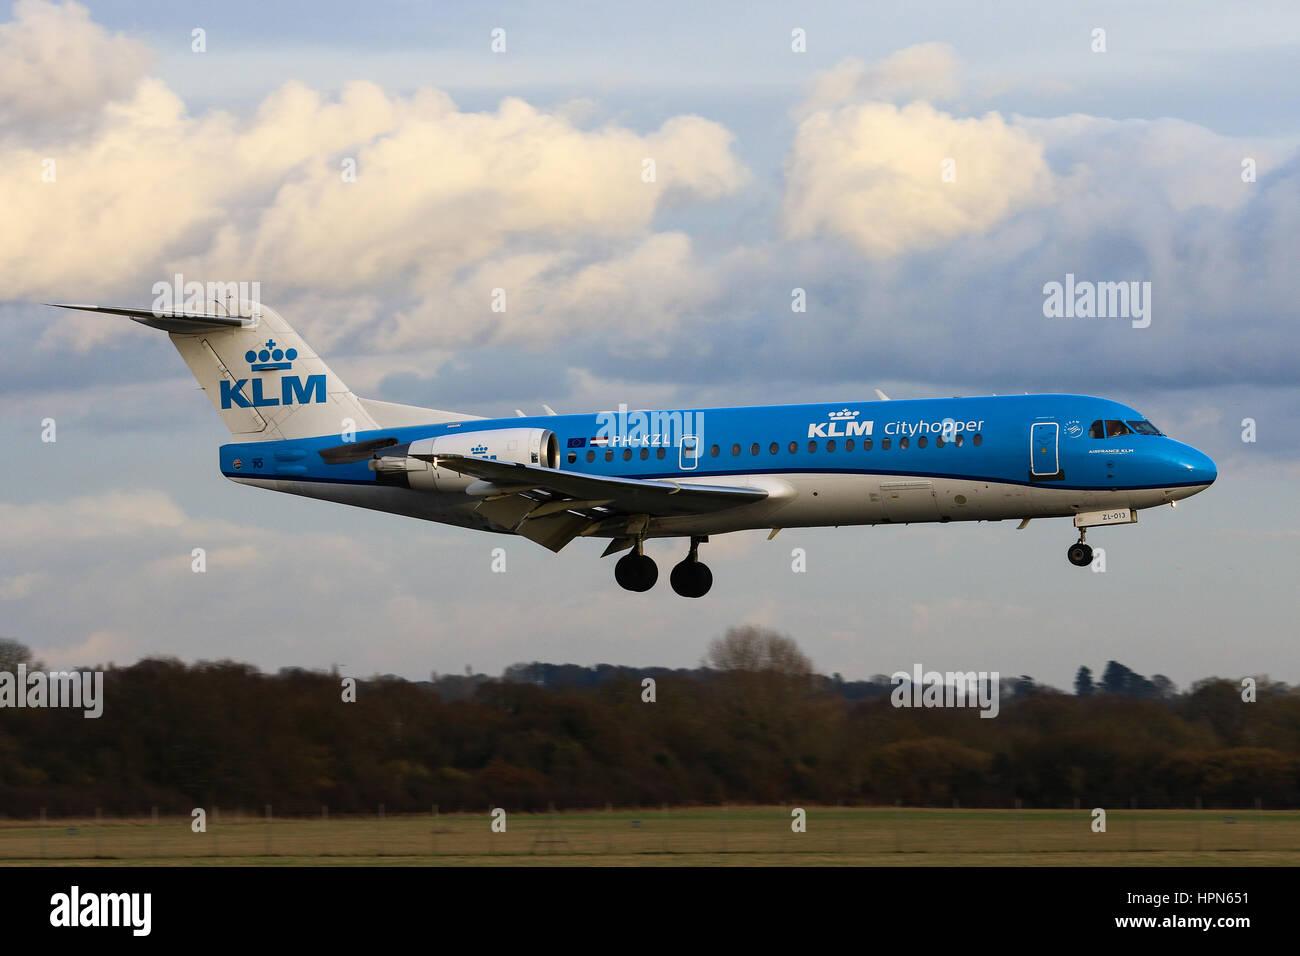 KLM Cityhopper Fokker 70 landing at Southampton Airport - Stock Image